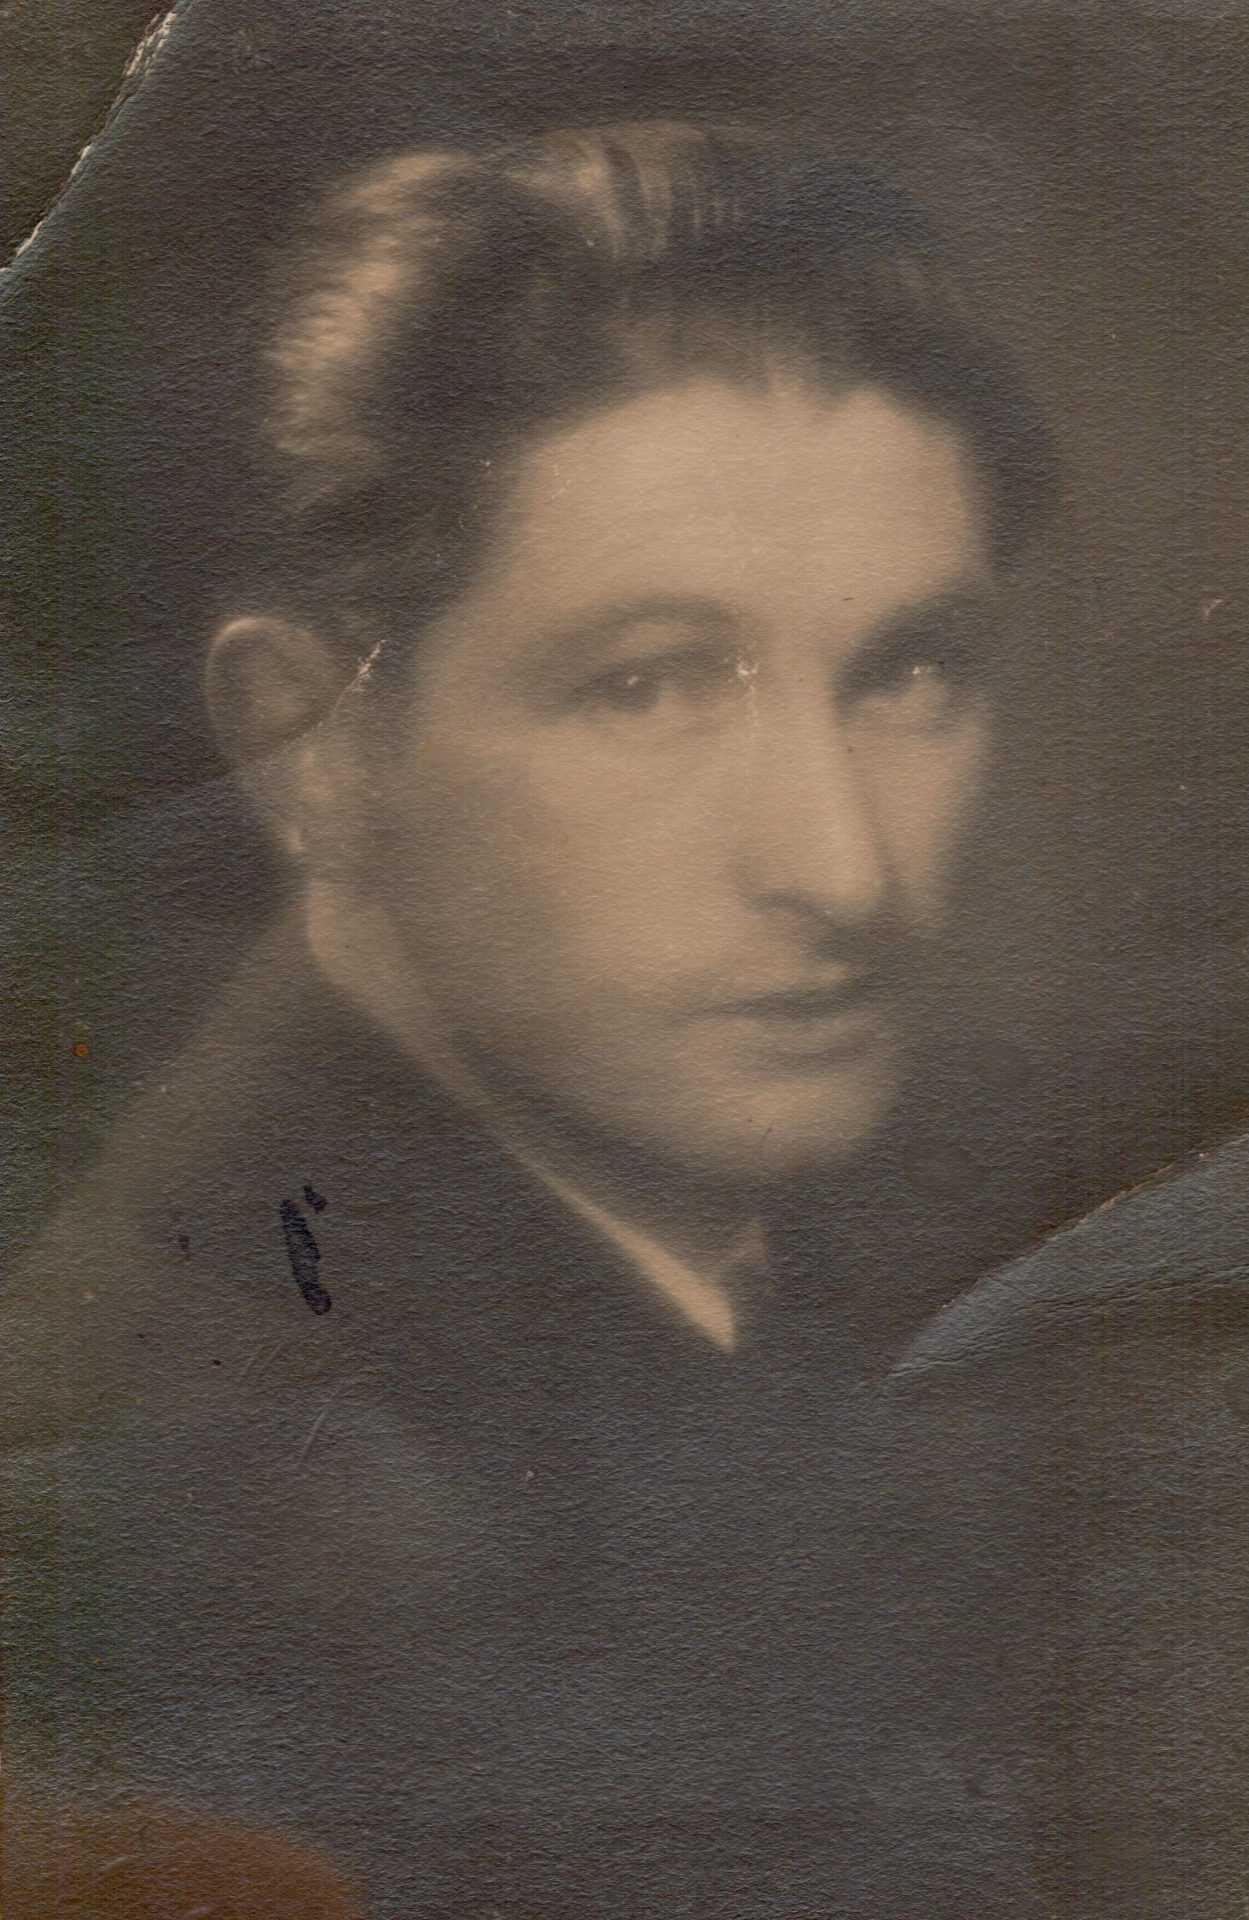 Manuel Mouriño Puga, home de Olivia